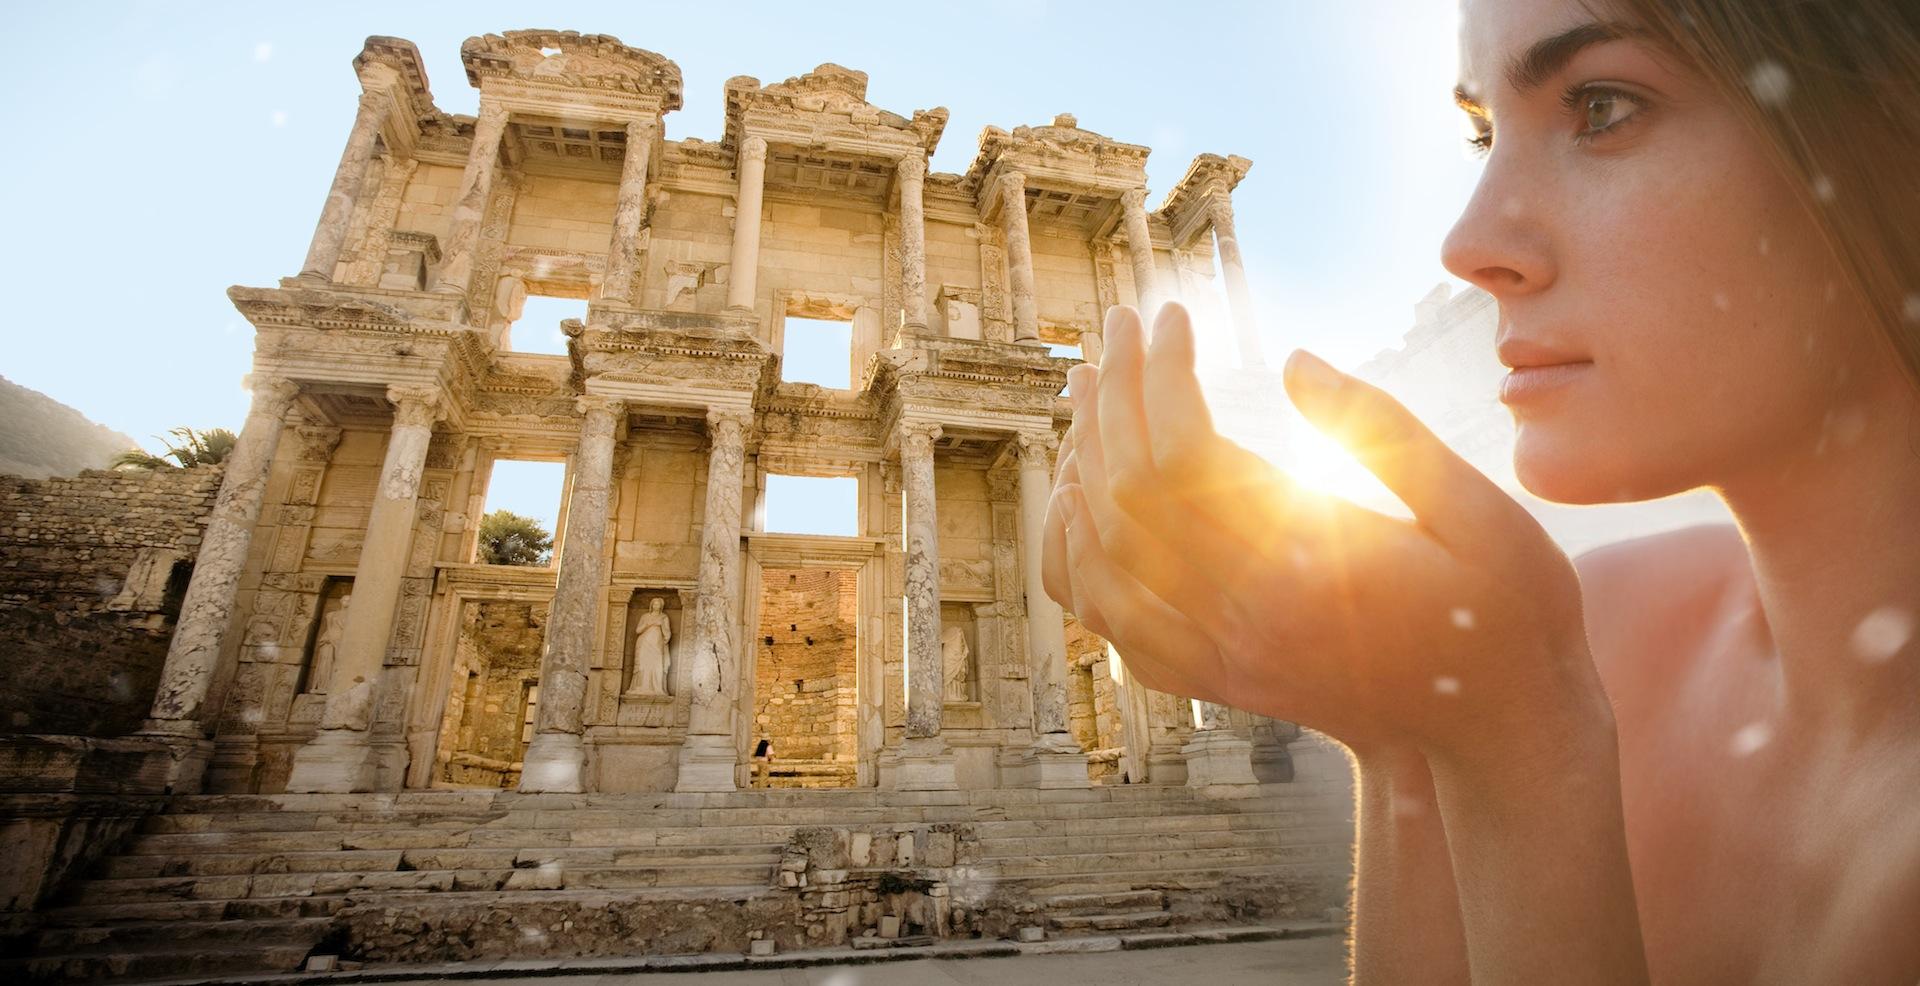 Photo: Ali Mert Özgün /Photography Tour Guide - Ephesus Celcus Library